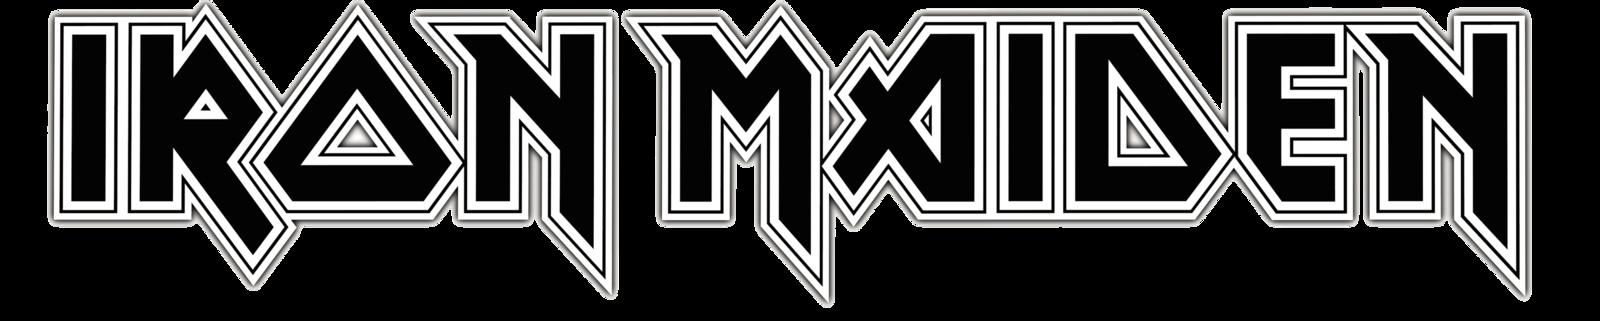 IRON MAIDEN live on ARTE concert - The complete headliner show from Wacken Open Air 2016